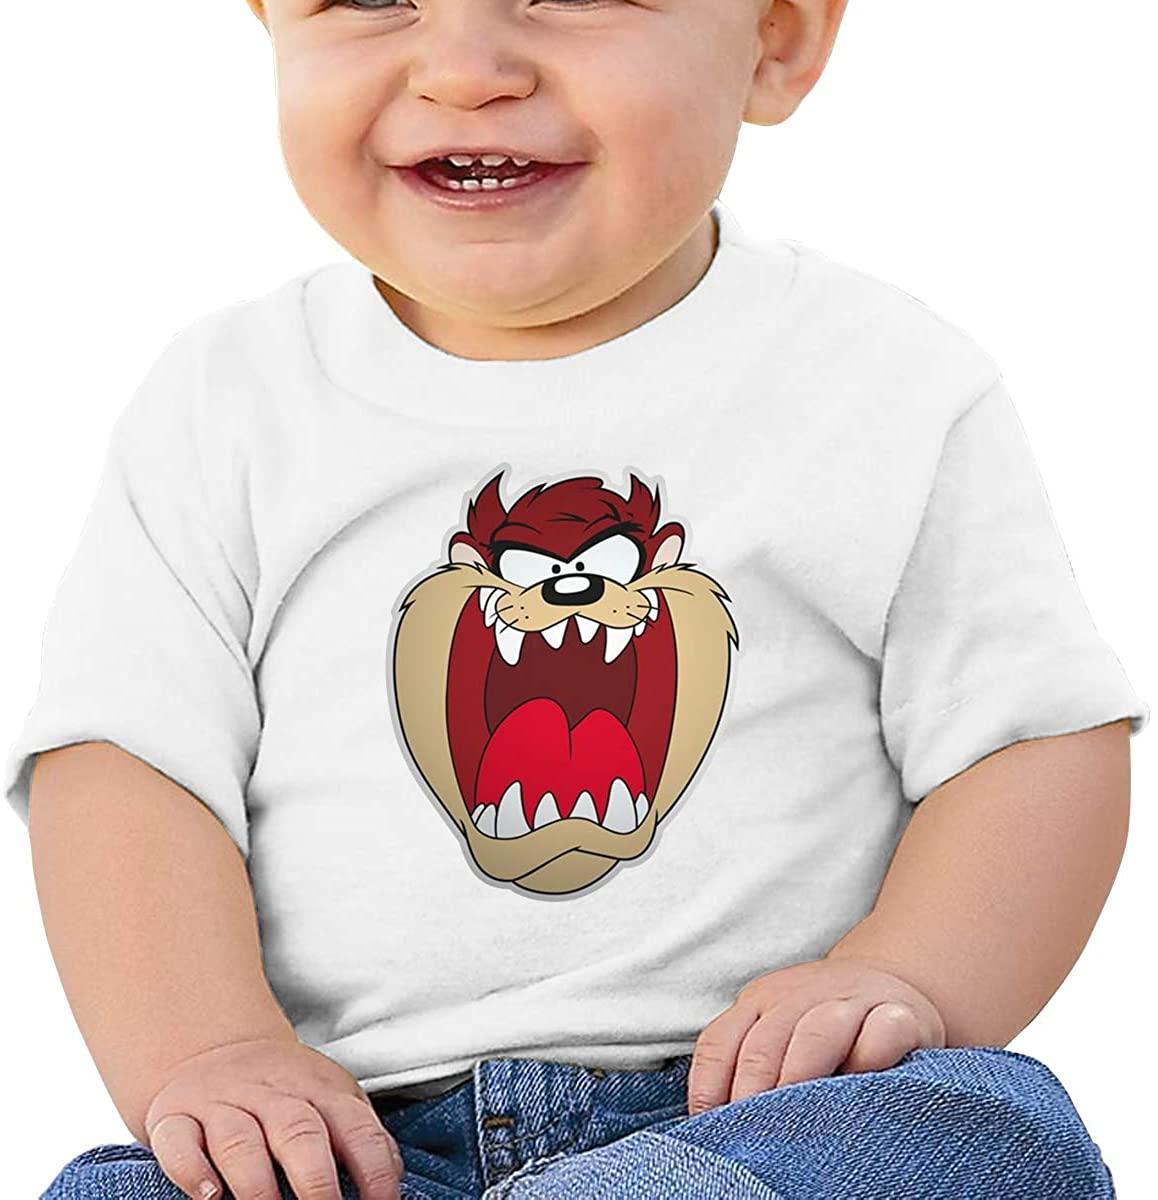 6-24 Months Boy and Girl Baby Short Sleeve T-Shirt Looney Tunes Tasmanian Devil Taz Original Minimalist Style White